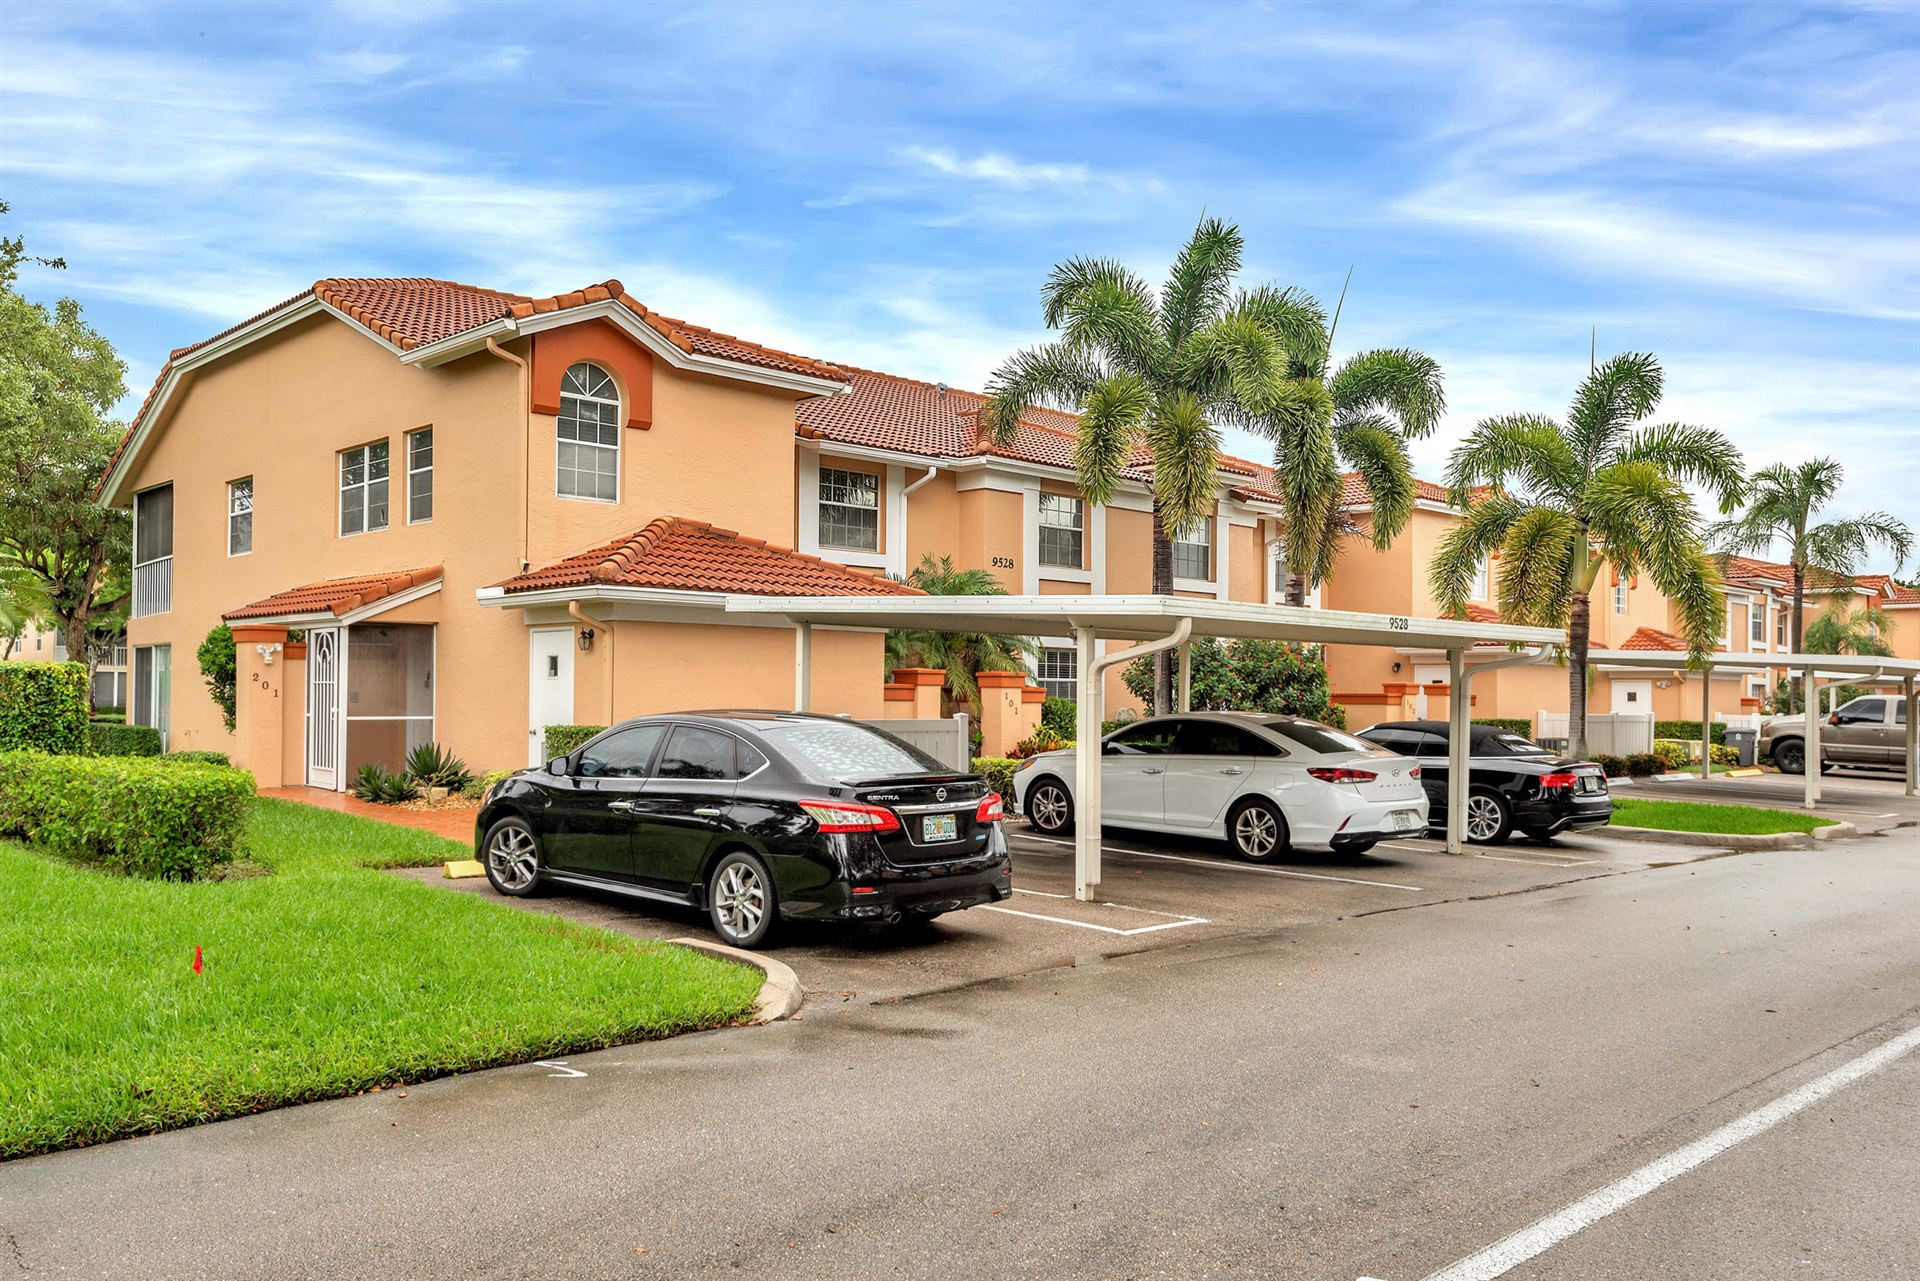 9528 Shadybrook Drive #201, Boynton Beach, FL 33437 - #: RX-10626082